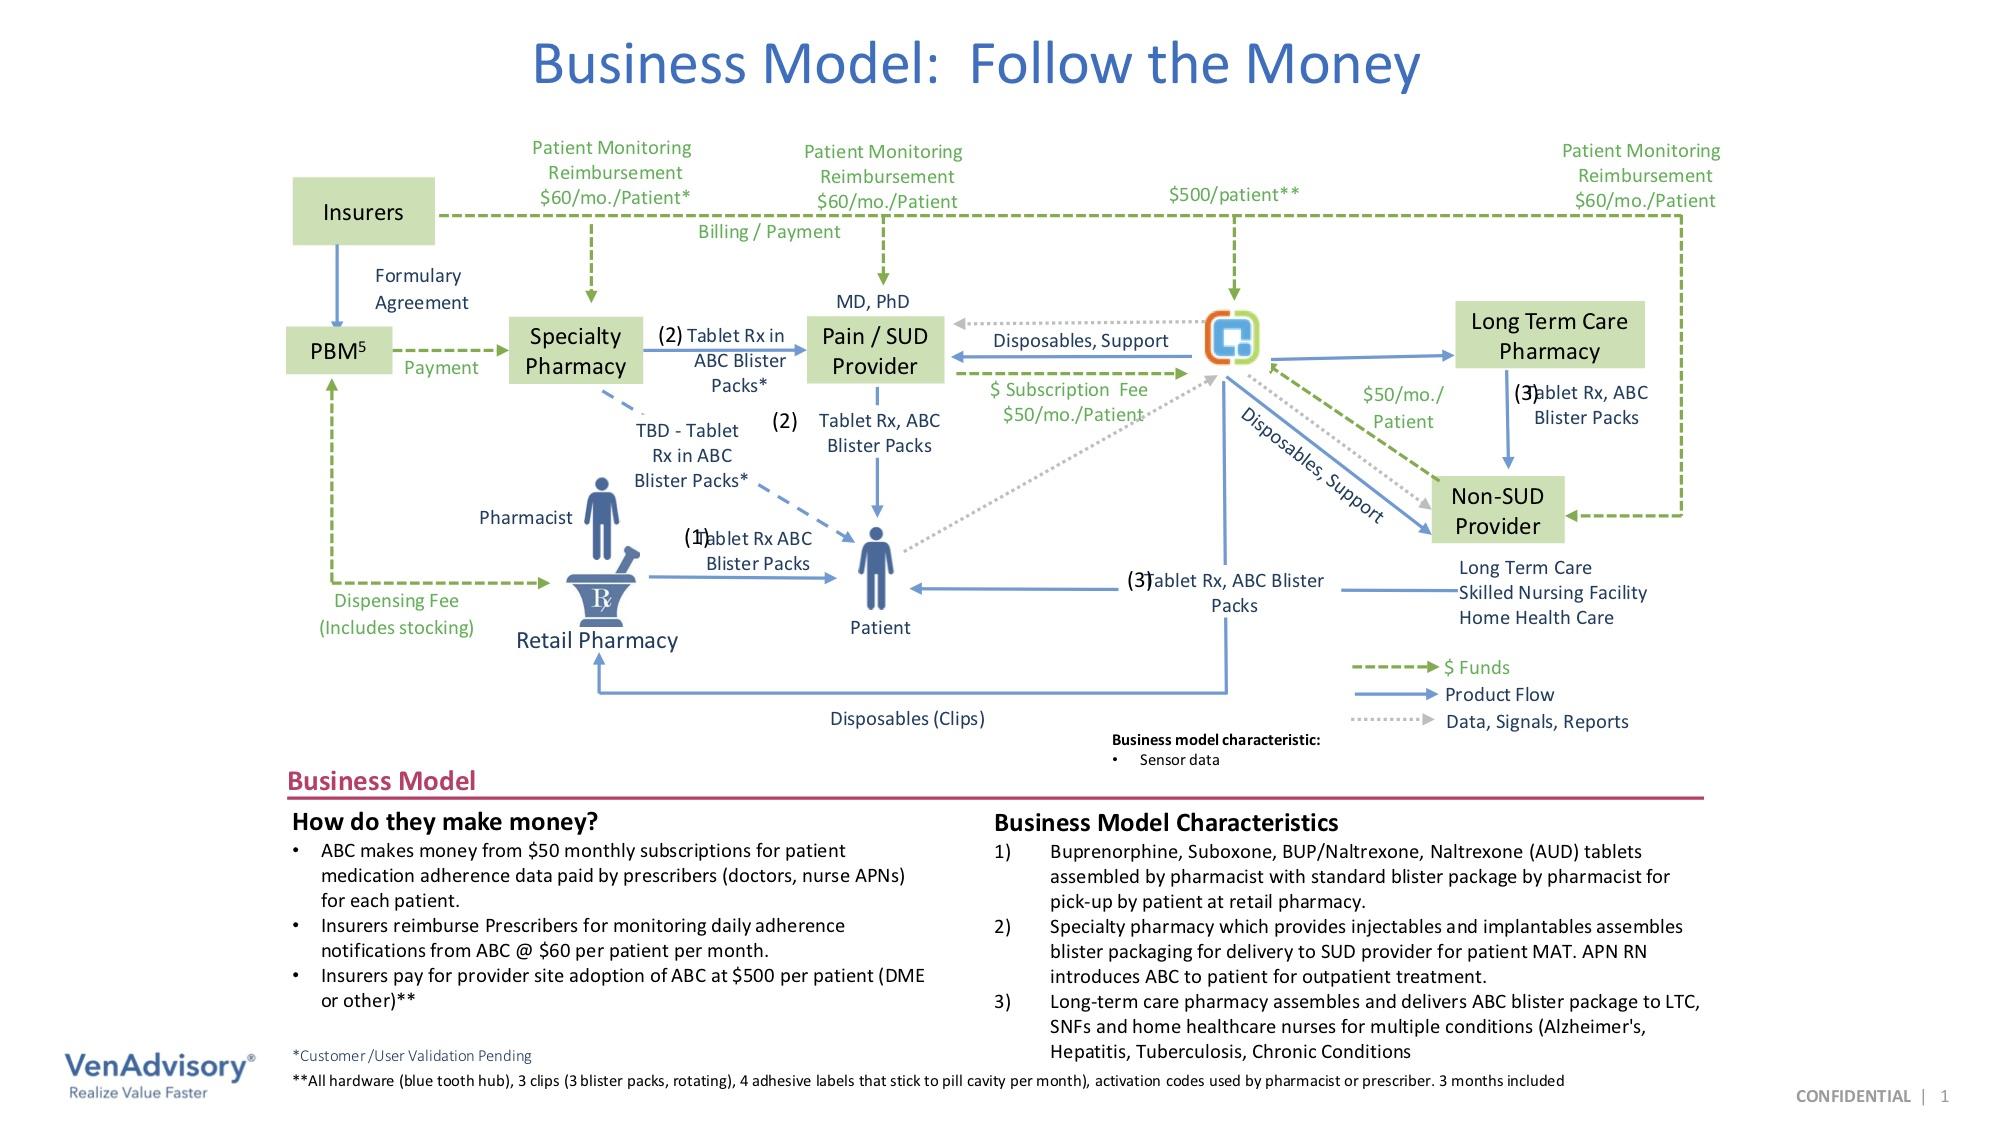 Follow-the-Money Business Model